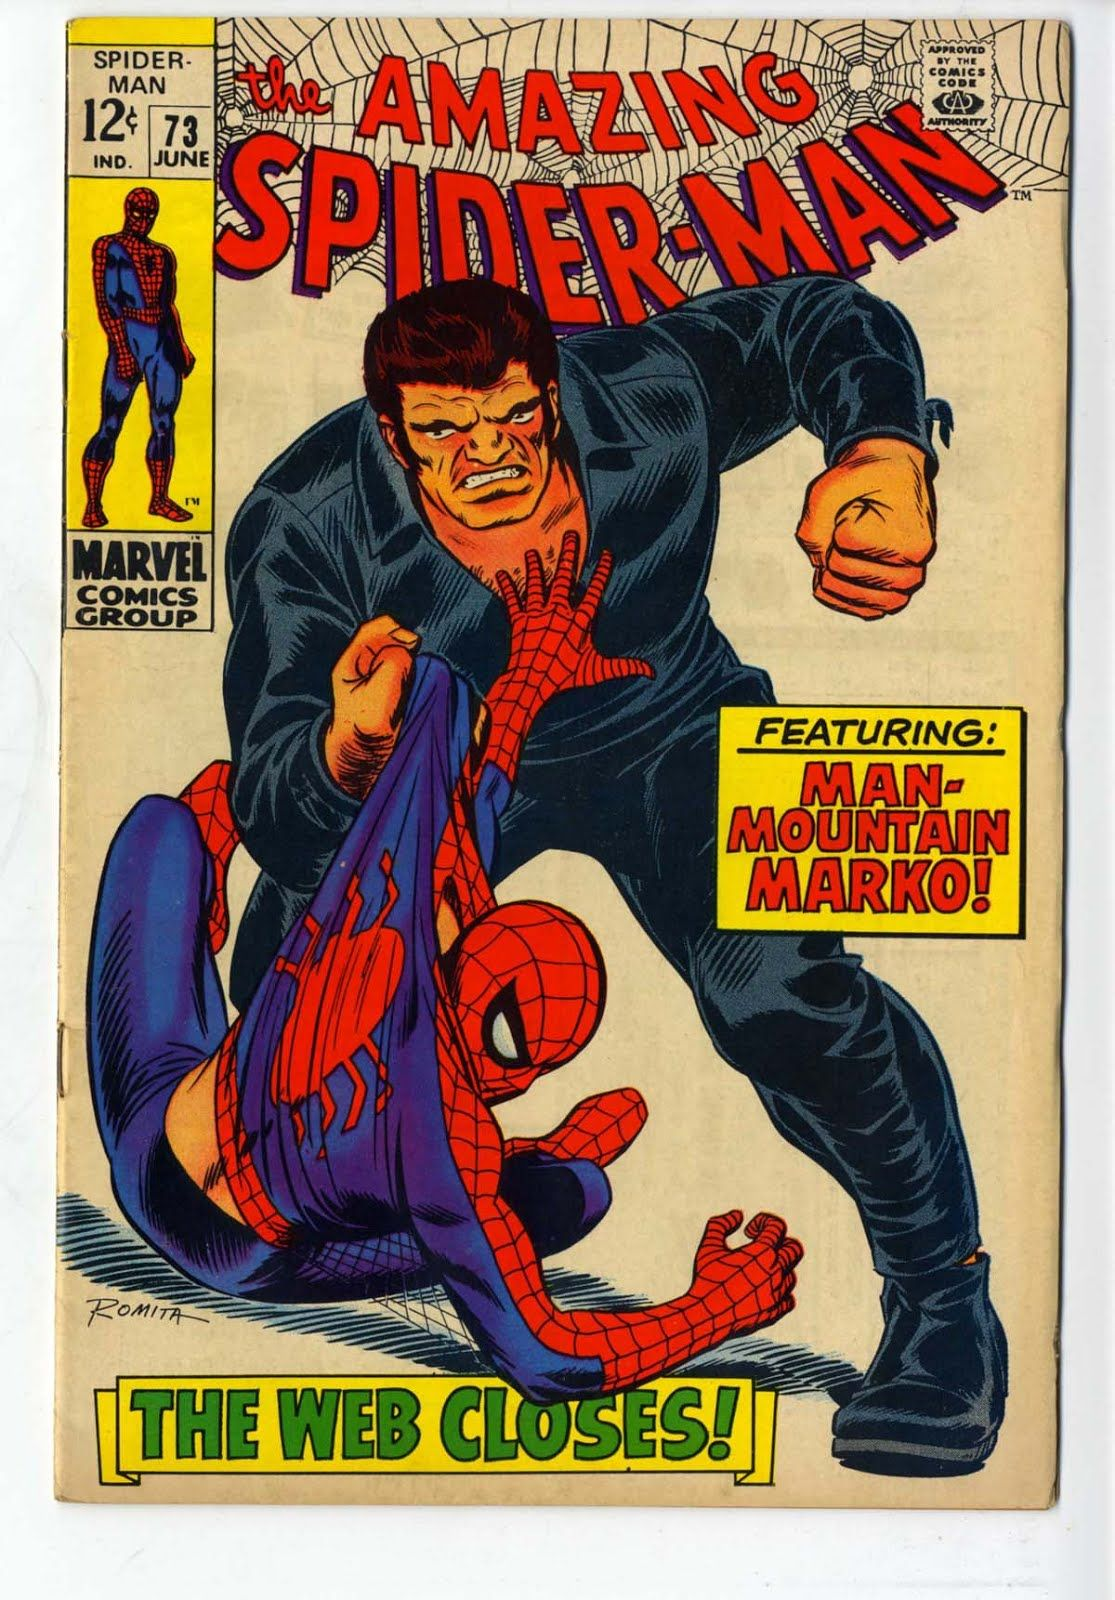 John persons comics for sale - For Sale Marvel Comics Amazing Spiderman 73 First Silvermane Stan Lee John Romita Artwork Silver Age Comic Book Emorys Memories